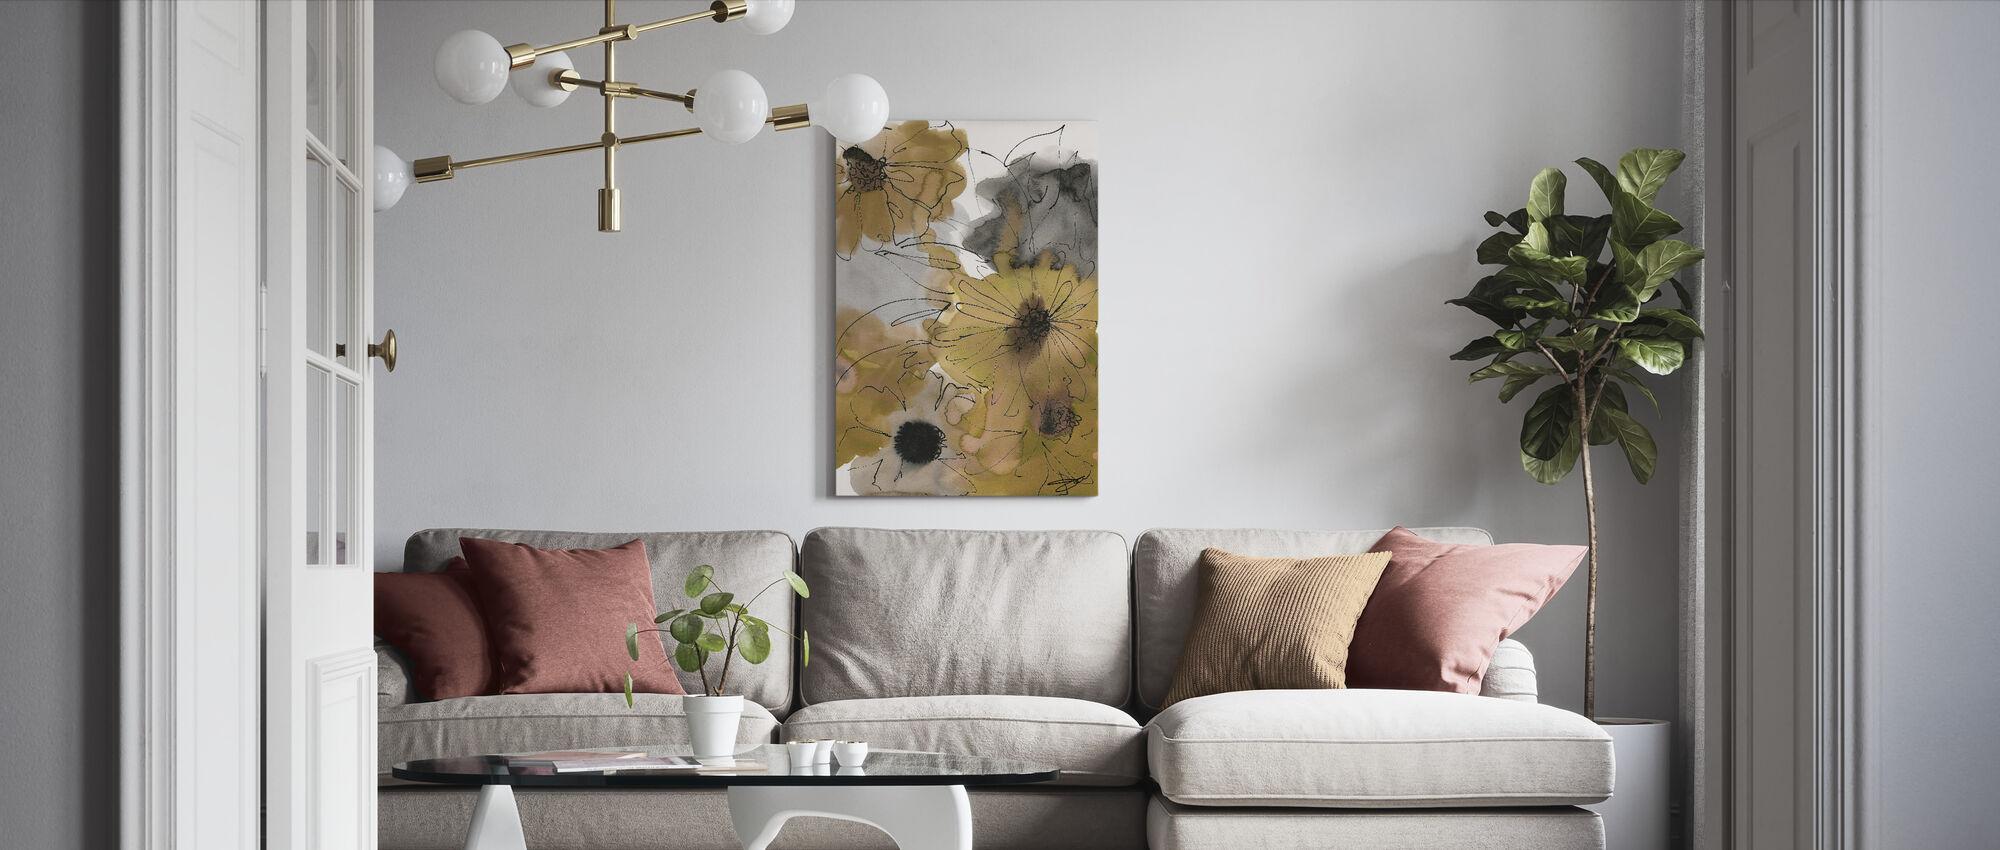 Tan Bloemen - Canvas print - Woonkamer